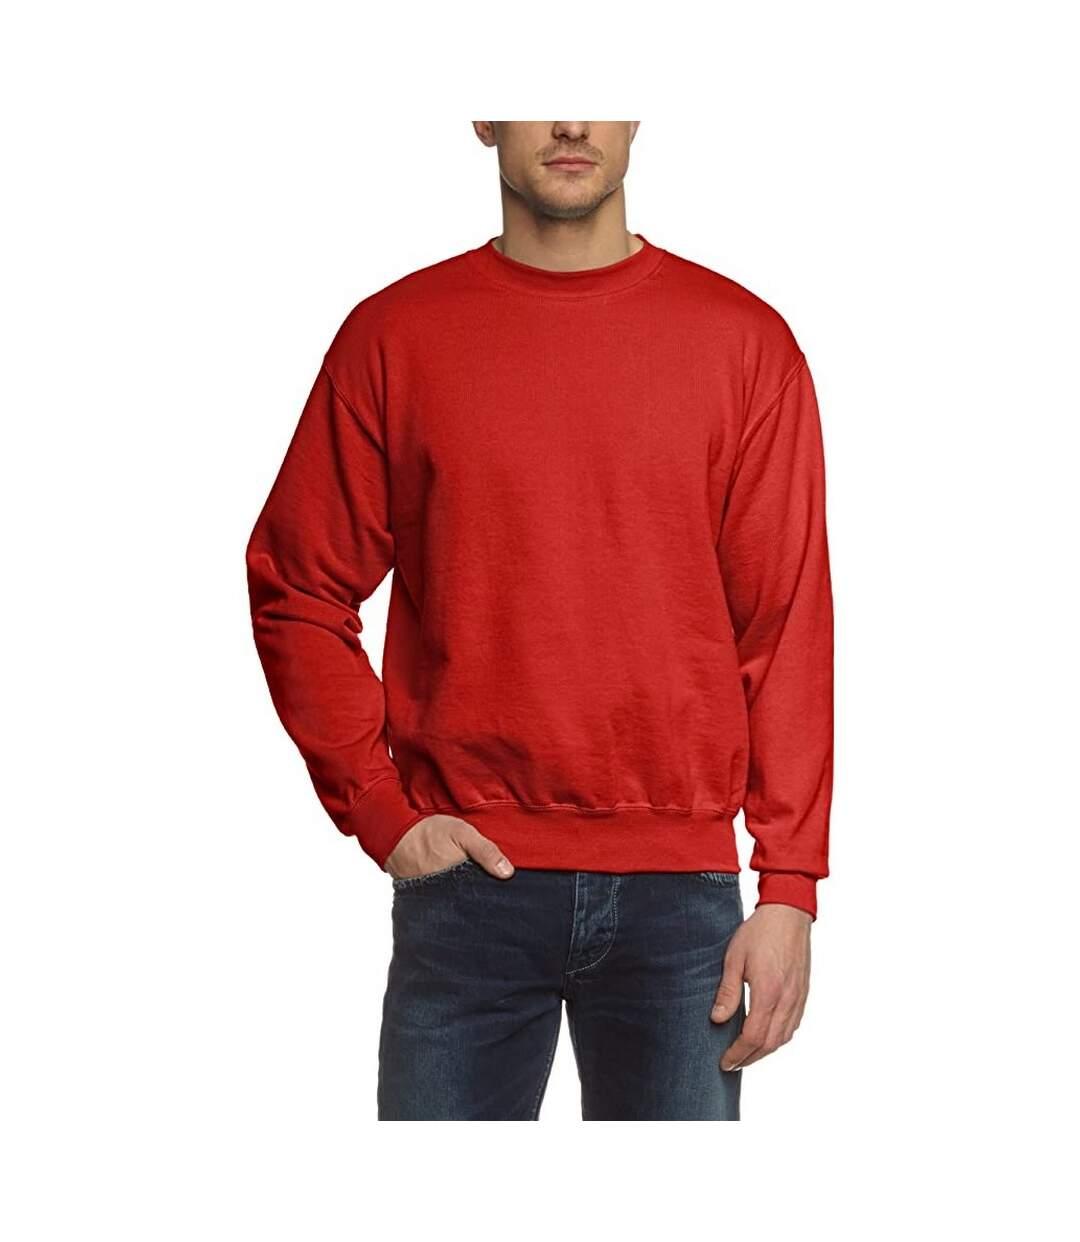 Fruit Of The Loom Unisex Premium 70/30 Set-In Sweatshirt (Red) - UTRW3159